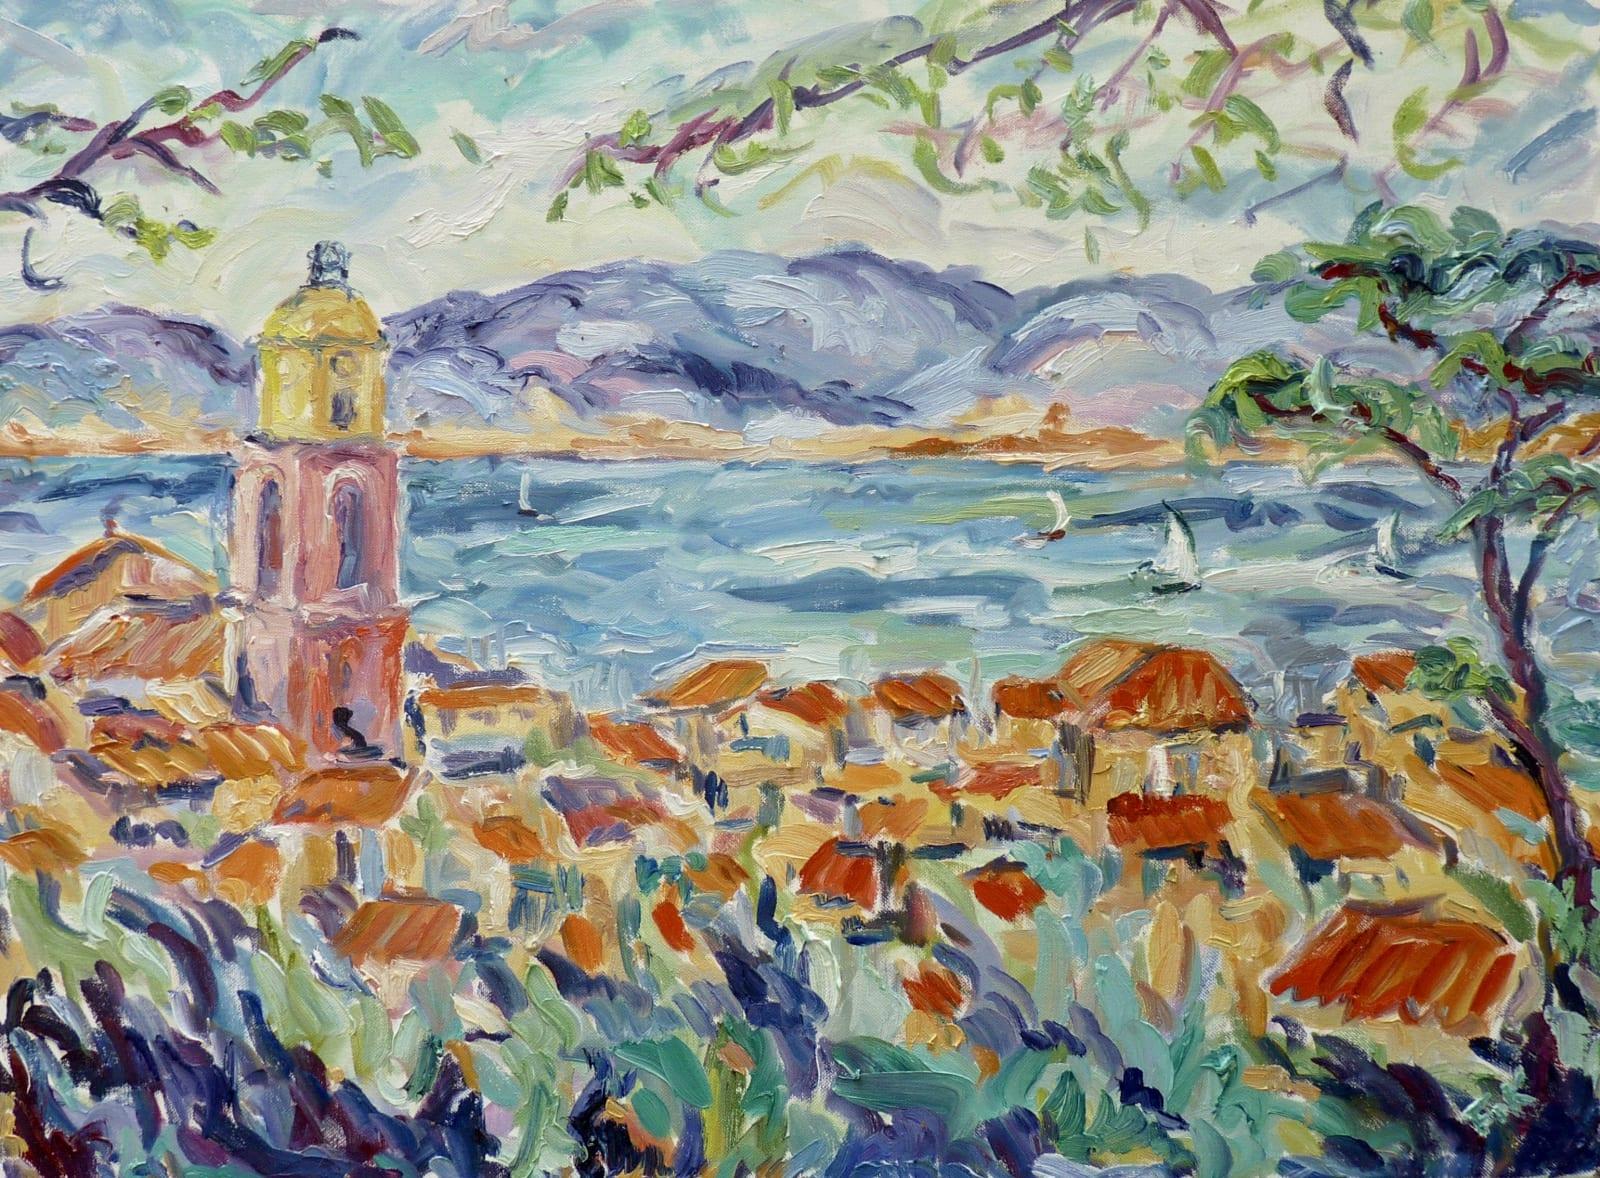 Fi Katzler, Morning Sun at St Tropez